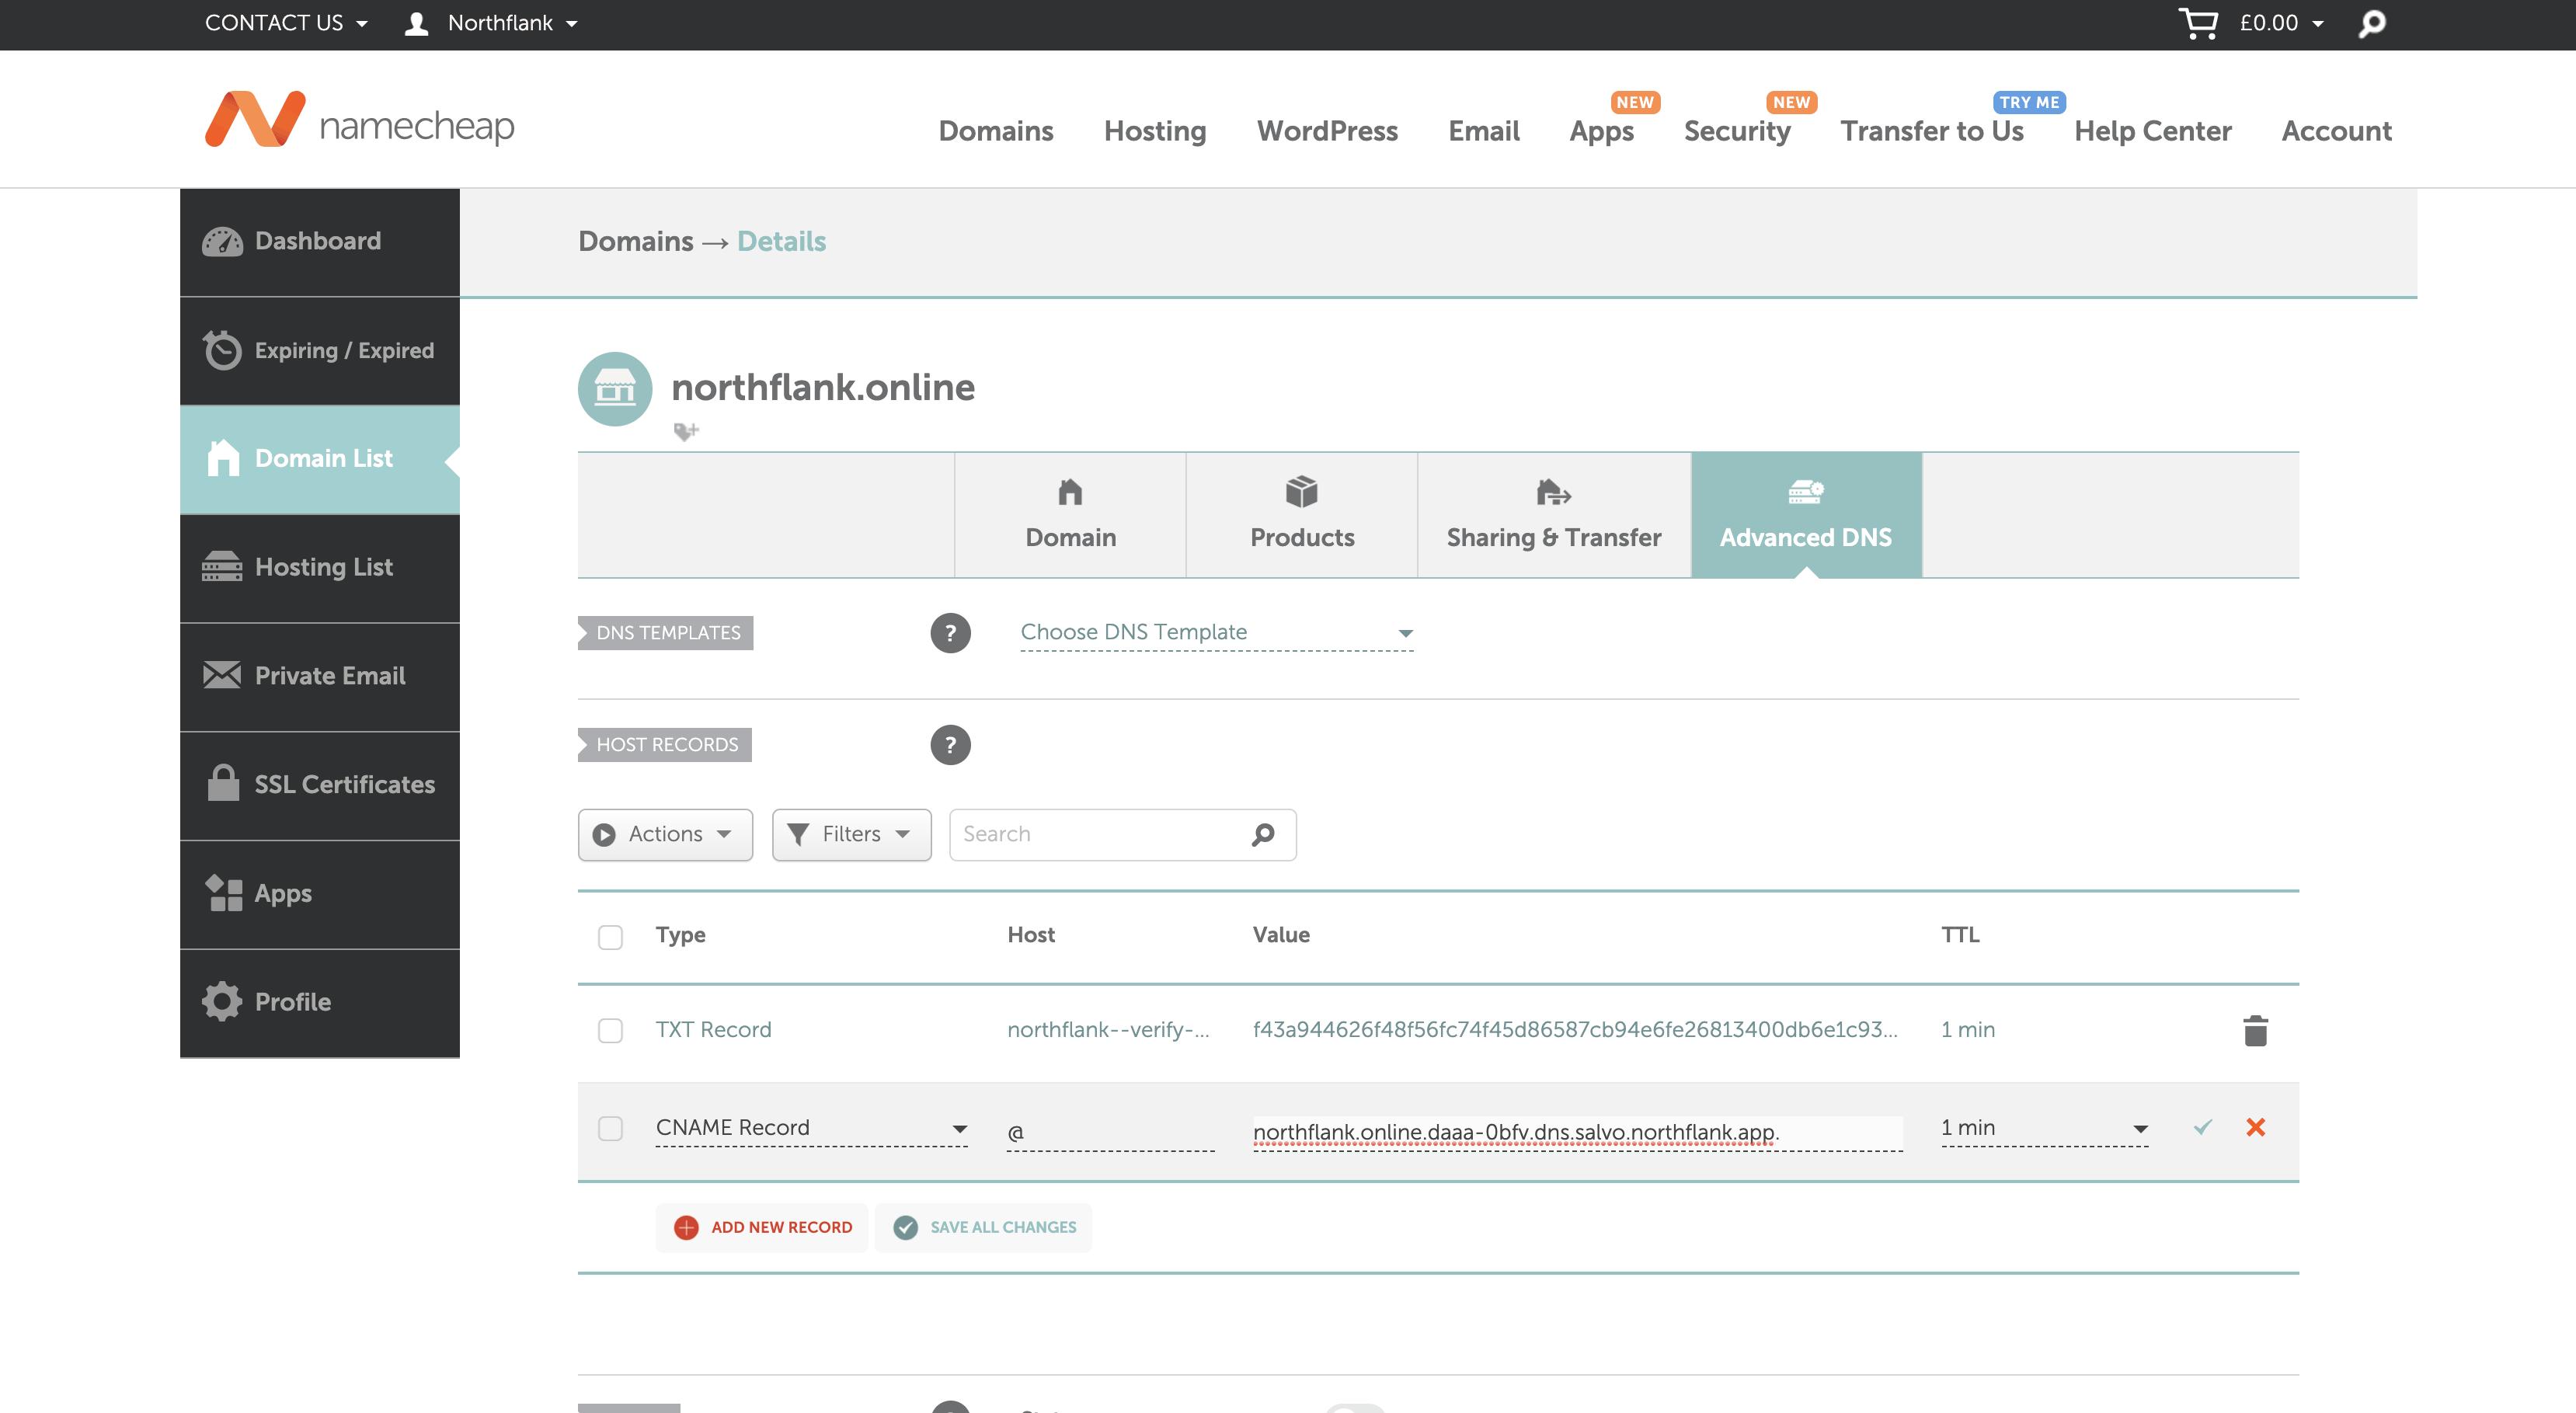 Adding an ALIAS record to link an apex domain on Namecheap